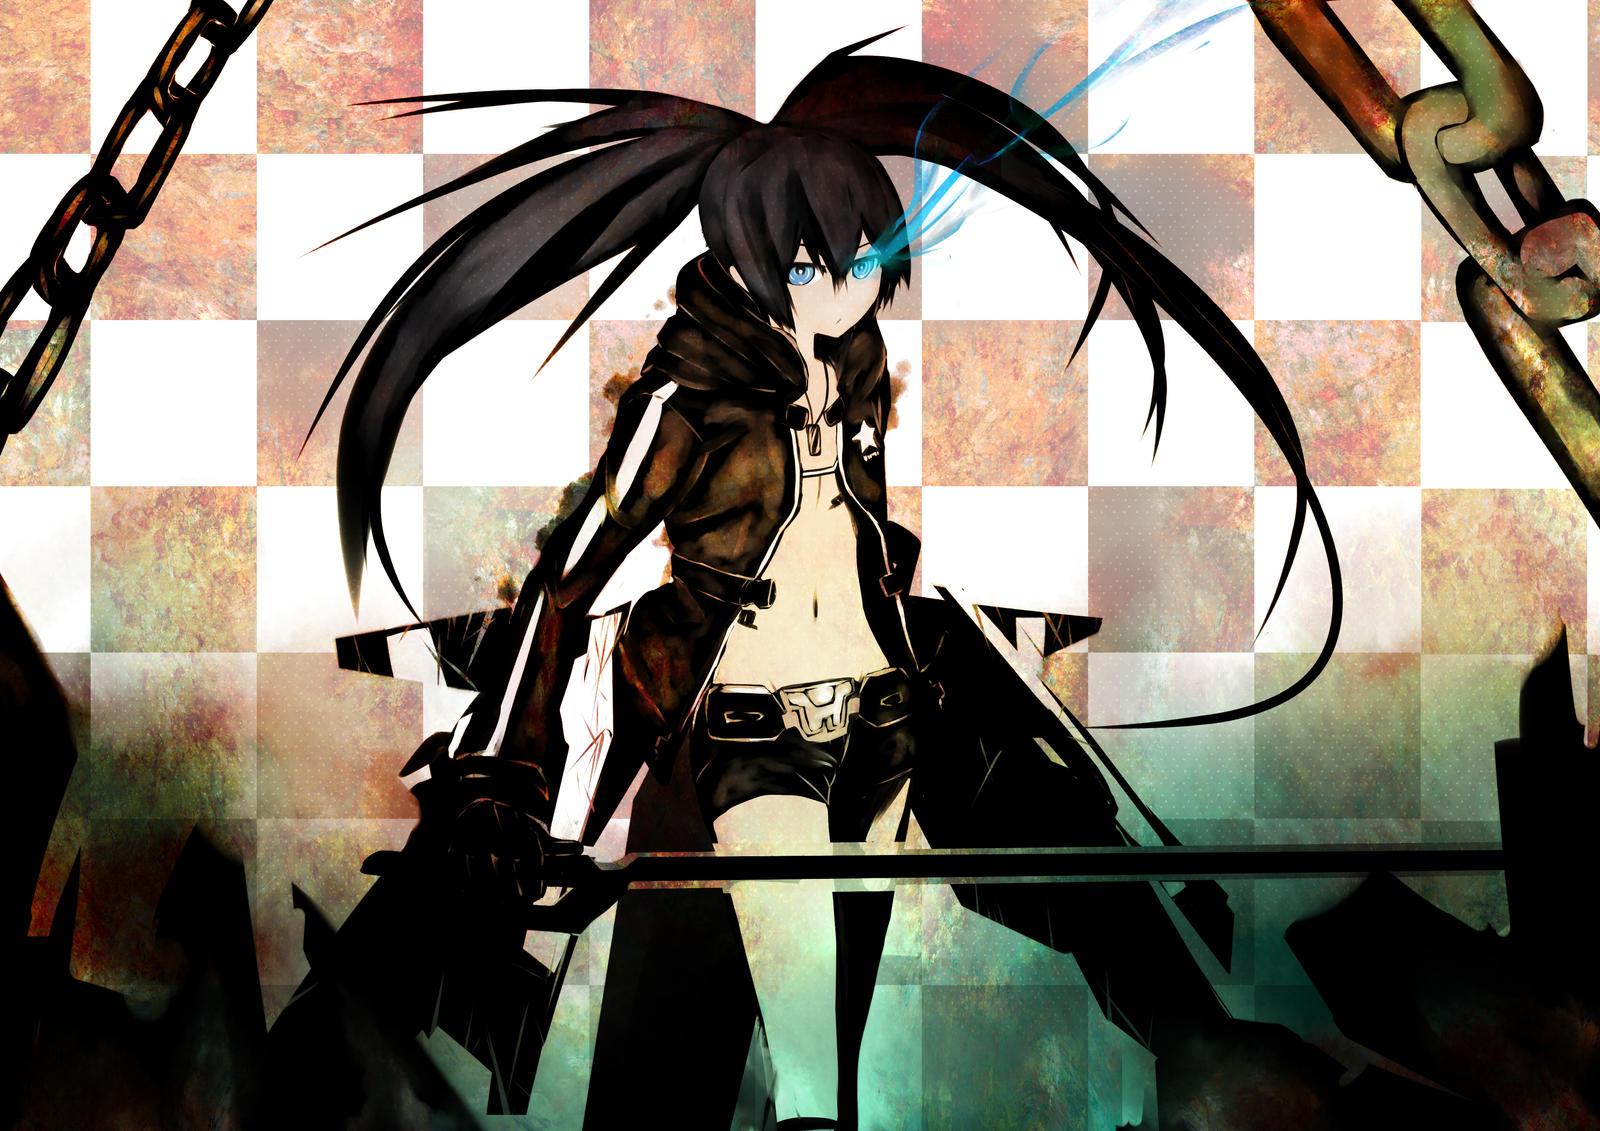 Black Rock Shooter The Game - PSP Black_rock_shooter_the_game_junp_ver__by_eizenhower-d5jnedi